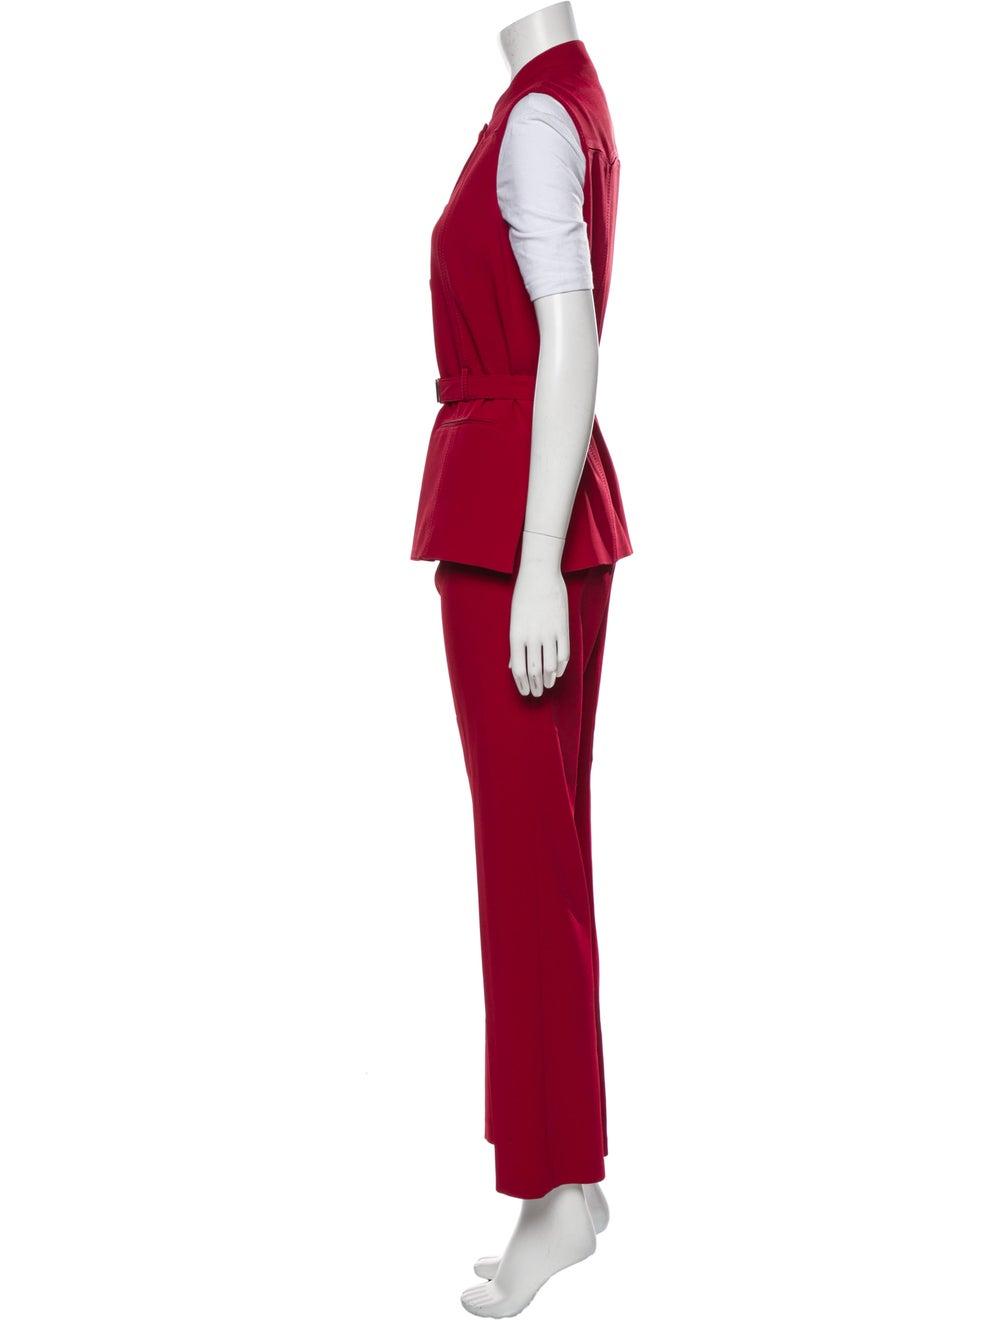 Prada Vintage 1990's Pant Set Red - image 2